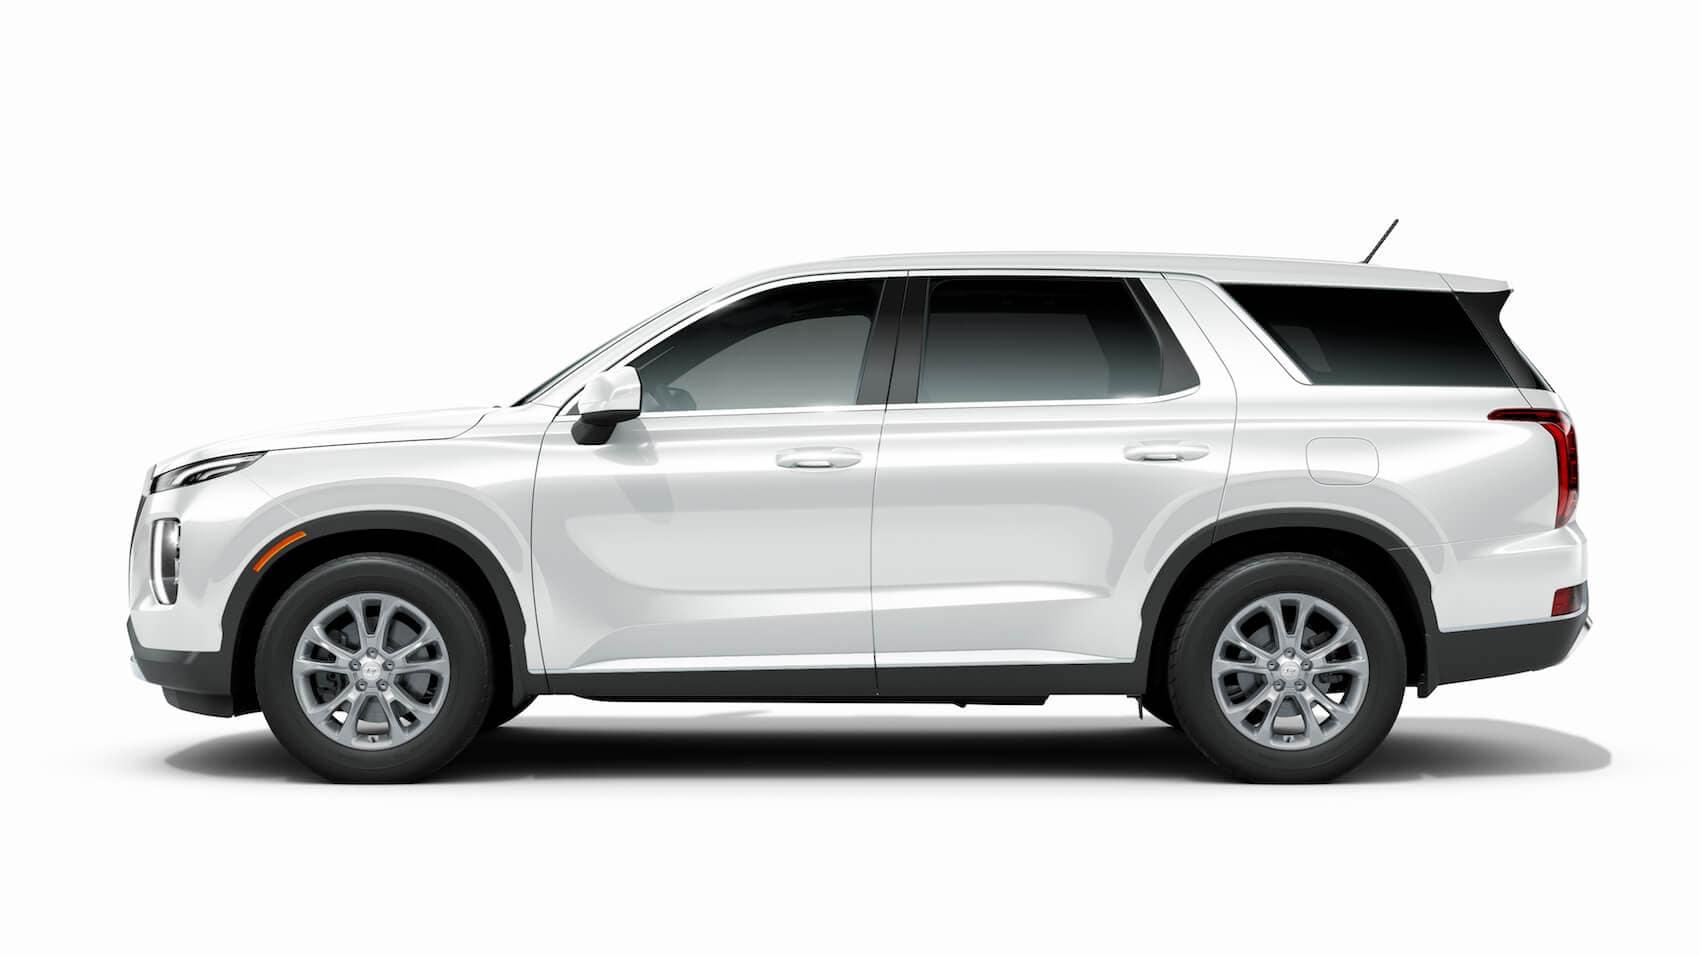 2020 Hyundai Palisade SE trim level Littleton, CO